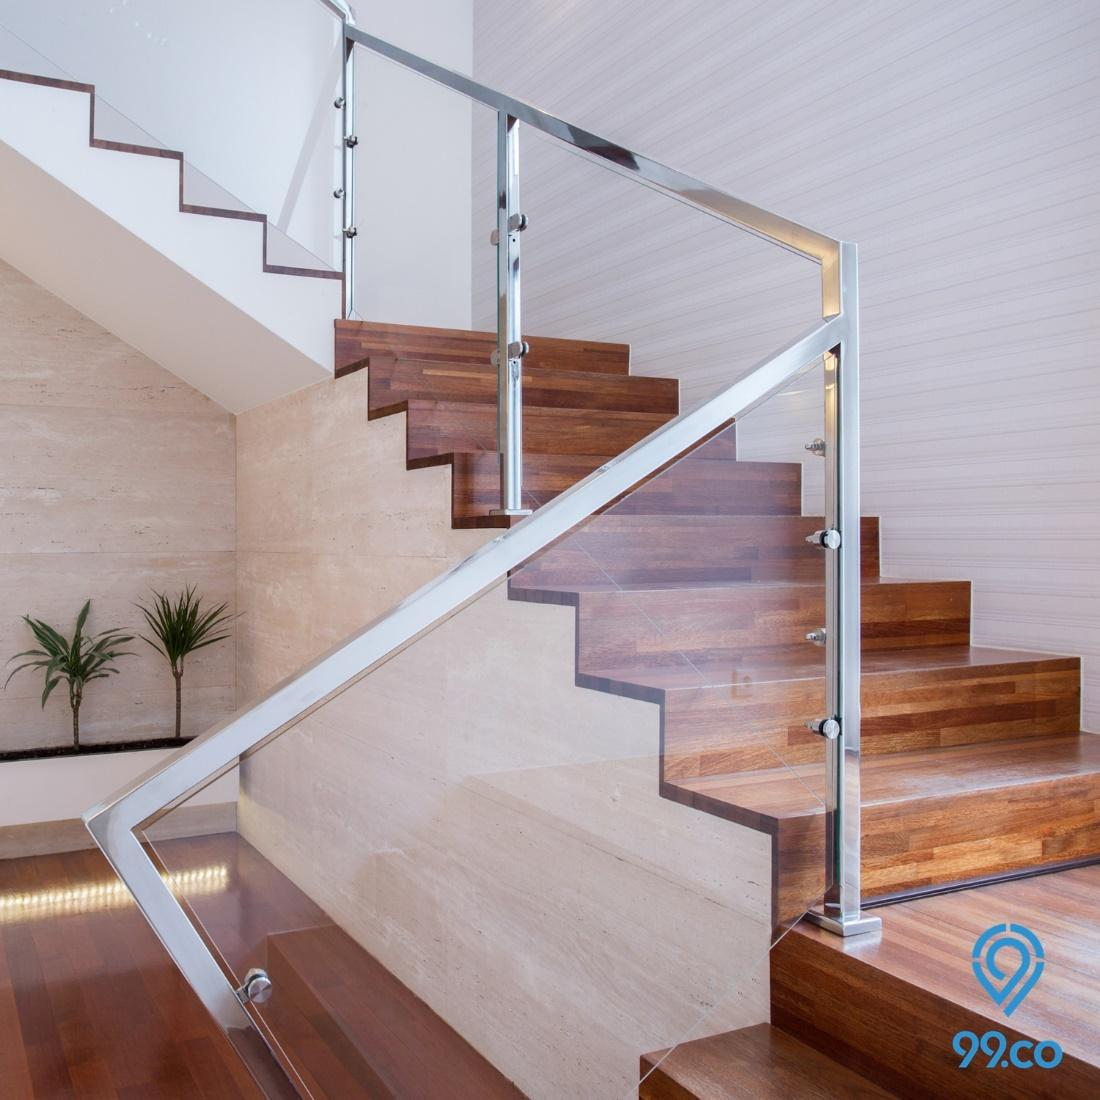 Membuat Railing Untuk Tangga Kumpulan Artikel Tips Arsitektur